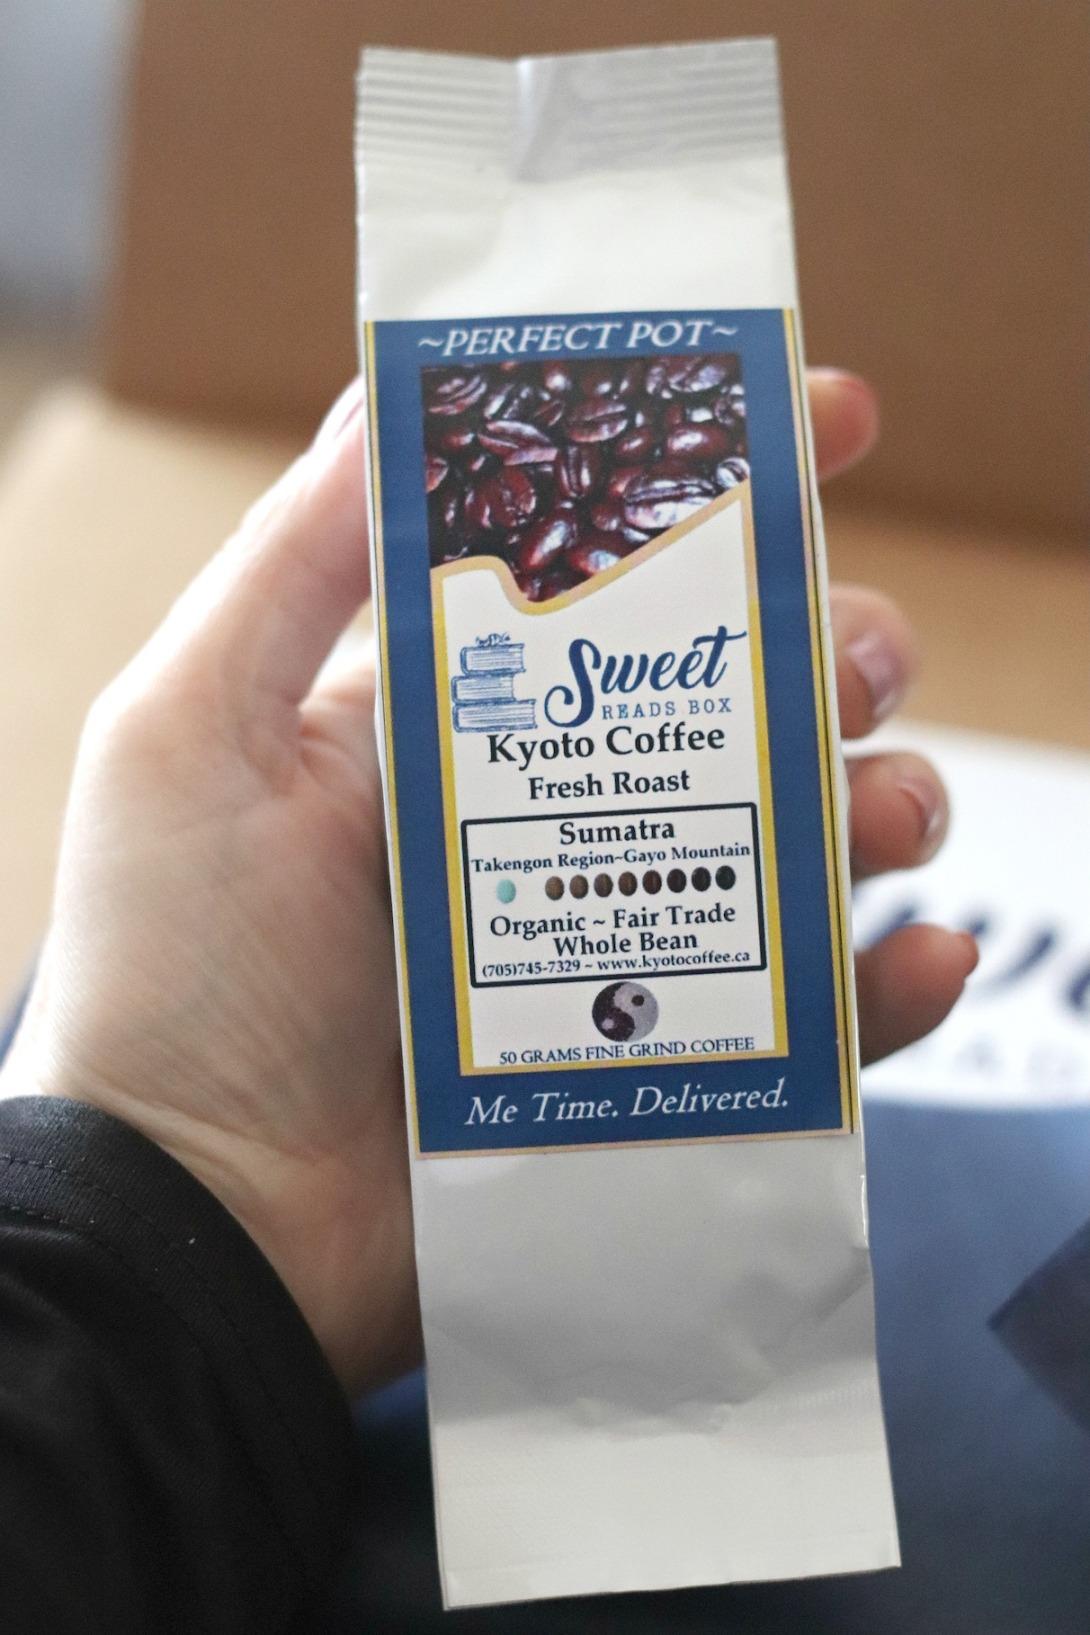 October Sweet Reads Box Kyoto Coffee Fresh Roast